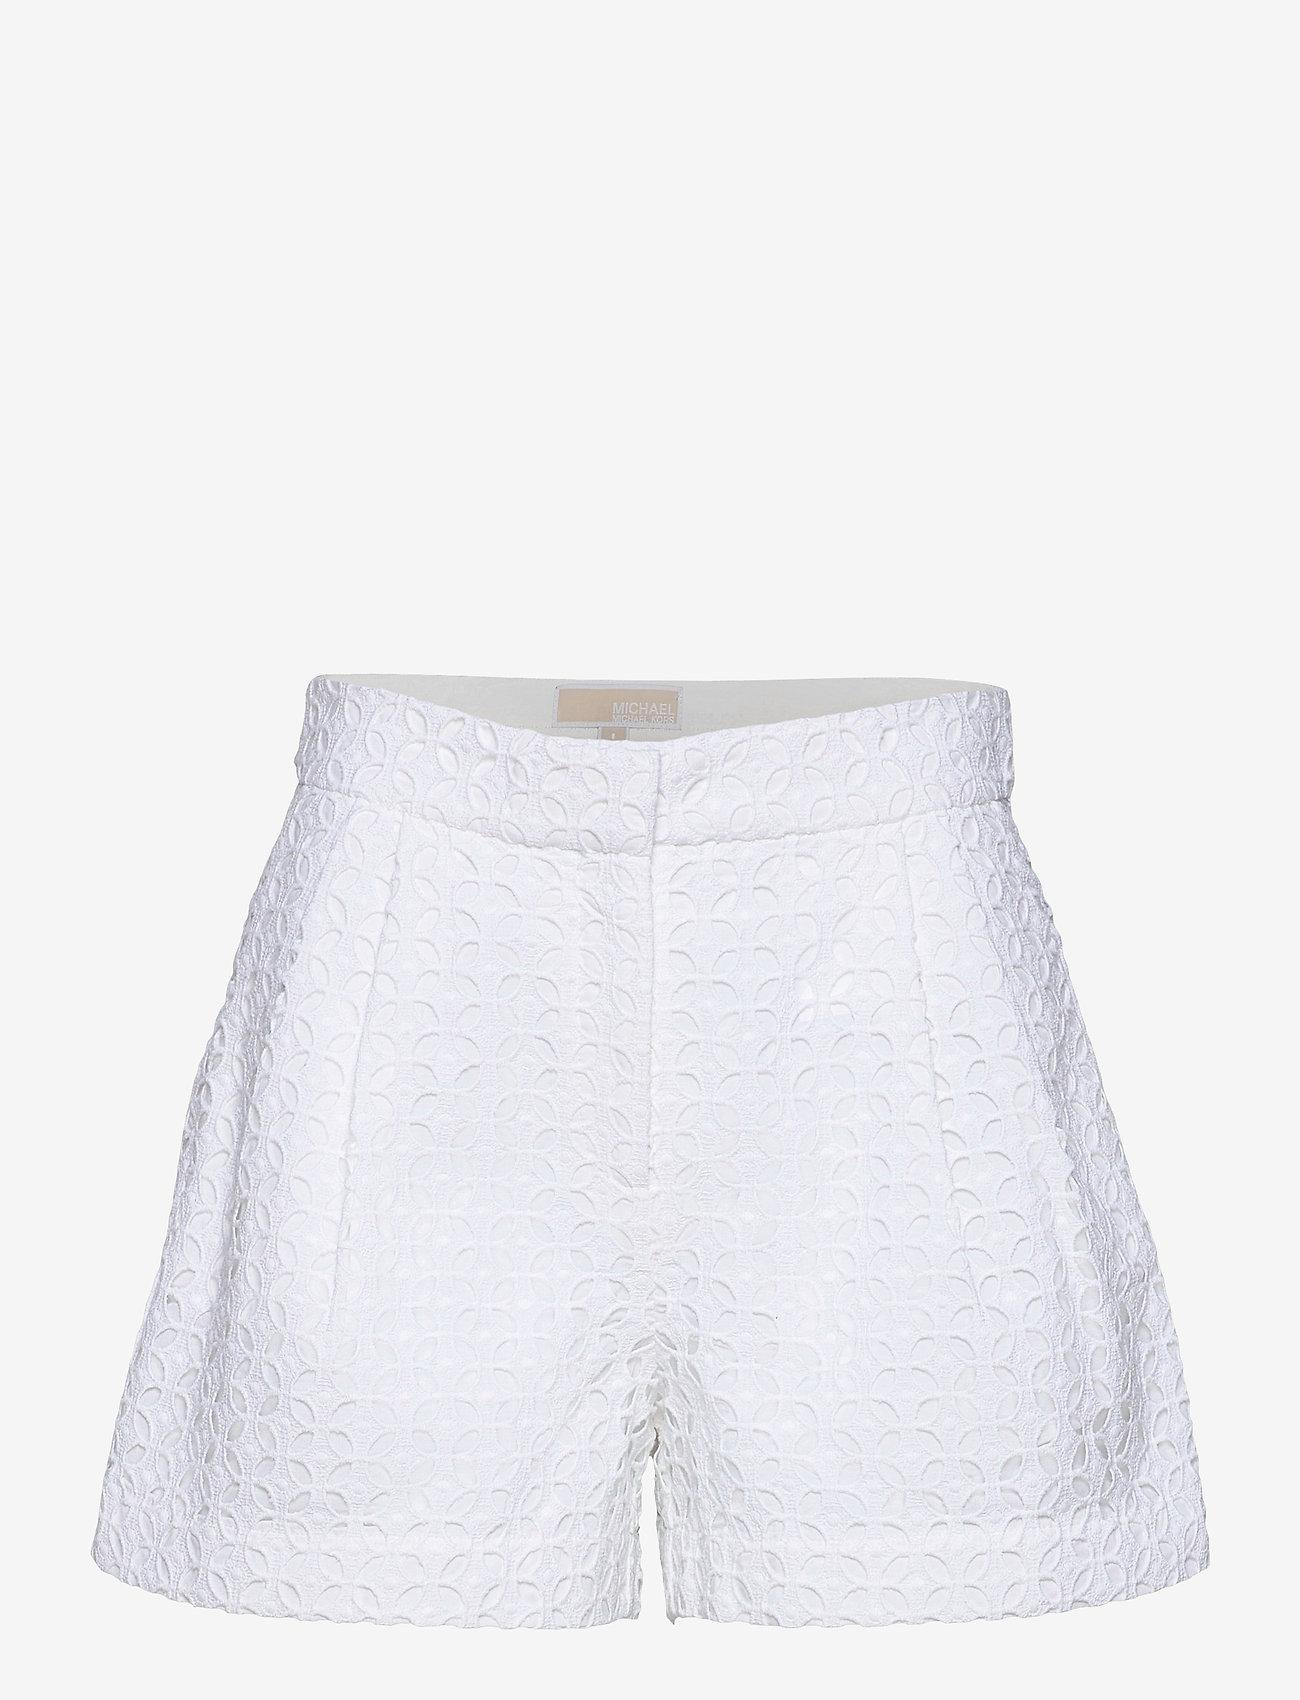 Michael Kors - EYELET PLEATED SHRT - shorts casual - white - 0